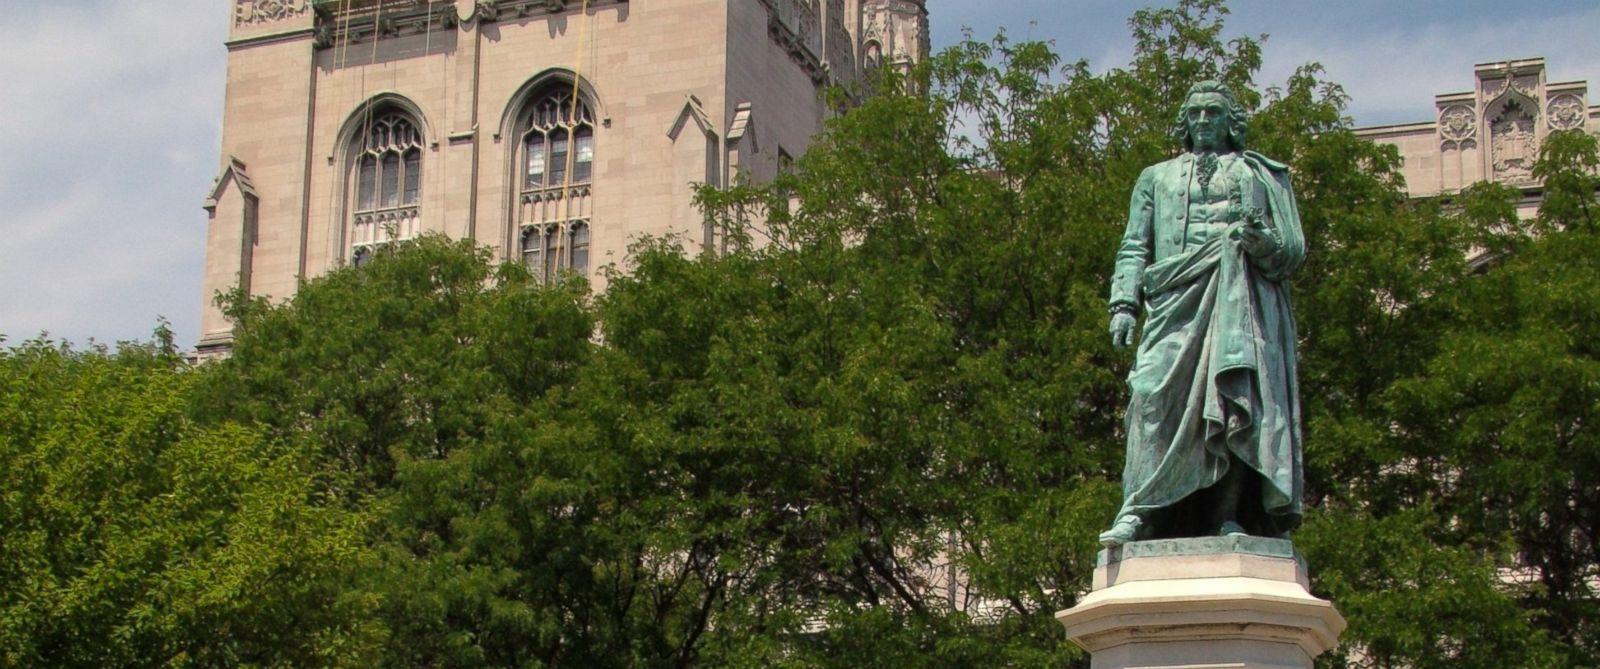 University of Chicago?